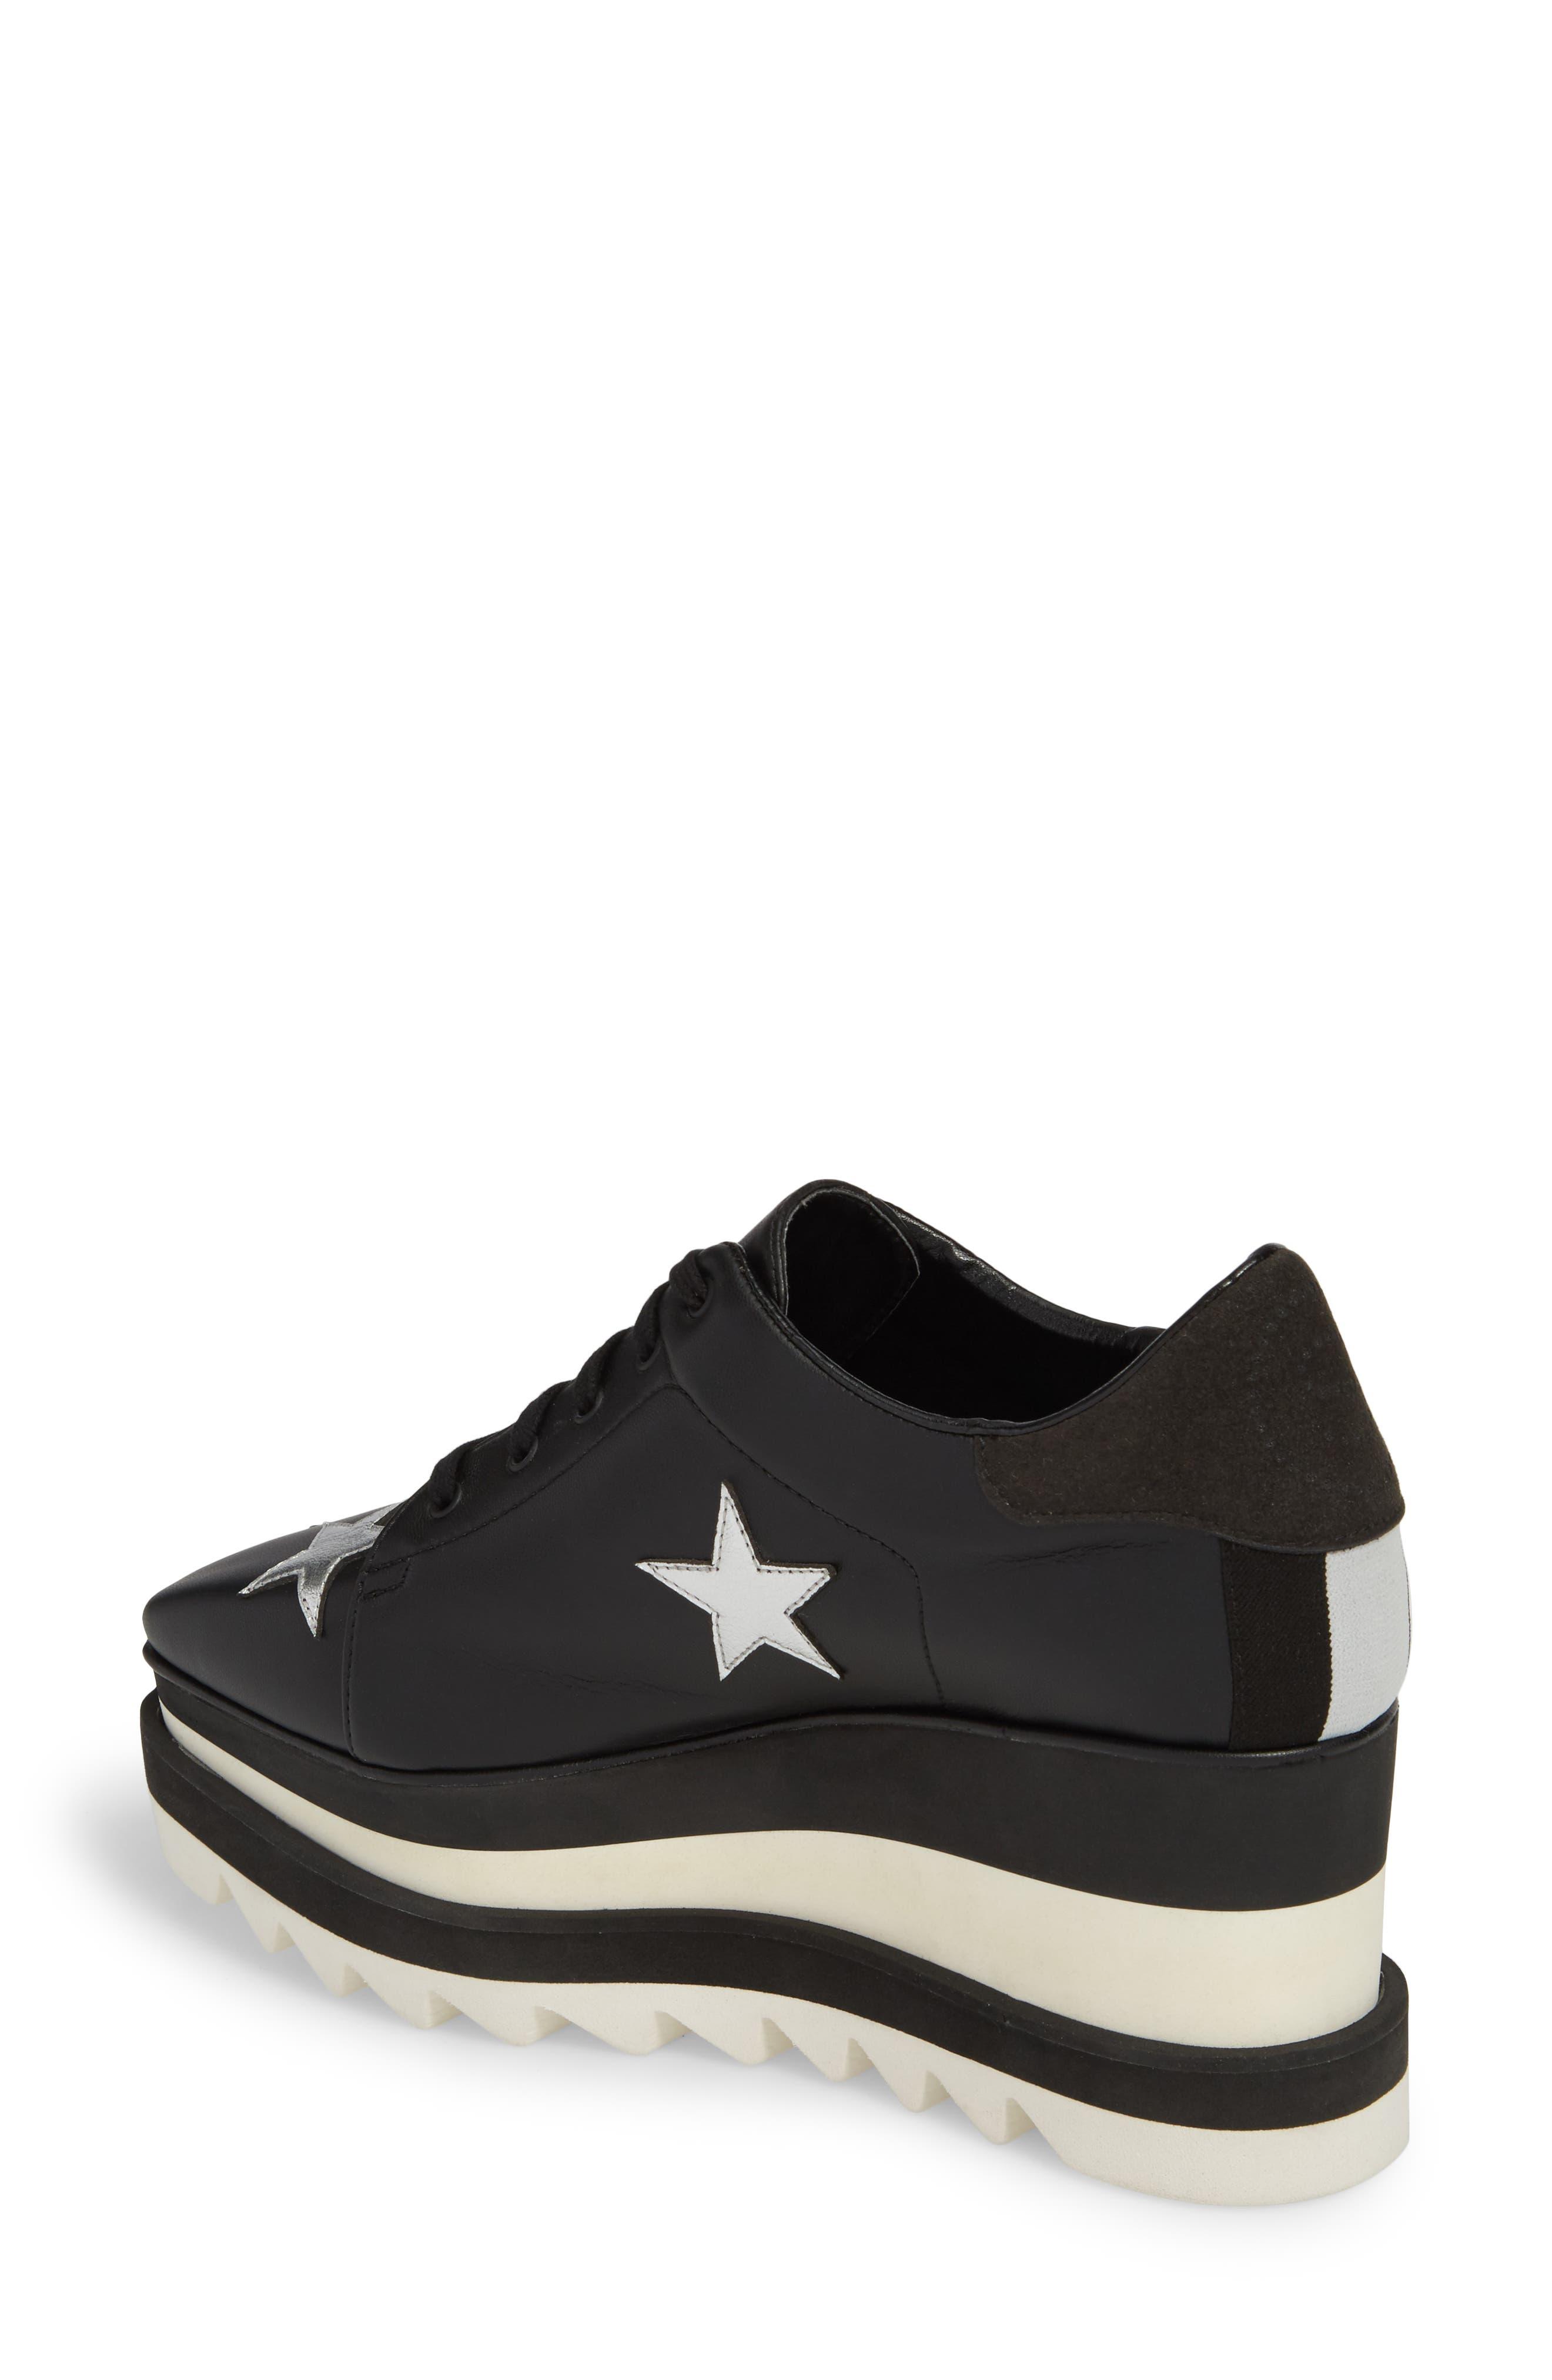 Elyse Platform Sneaker,                             Alternate thumbnail 2, color,                             BLACK